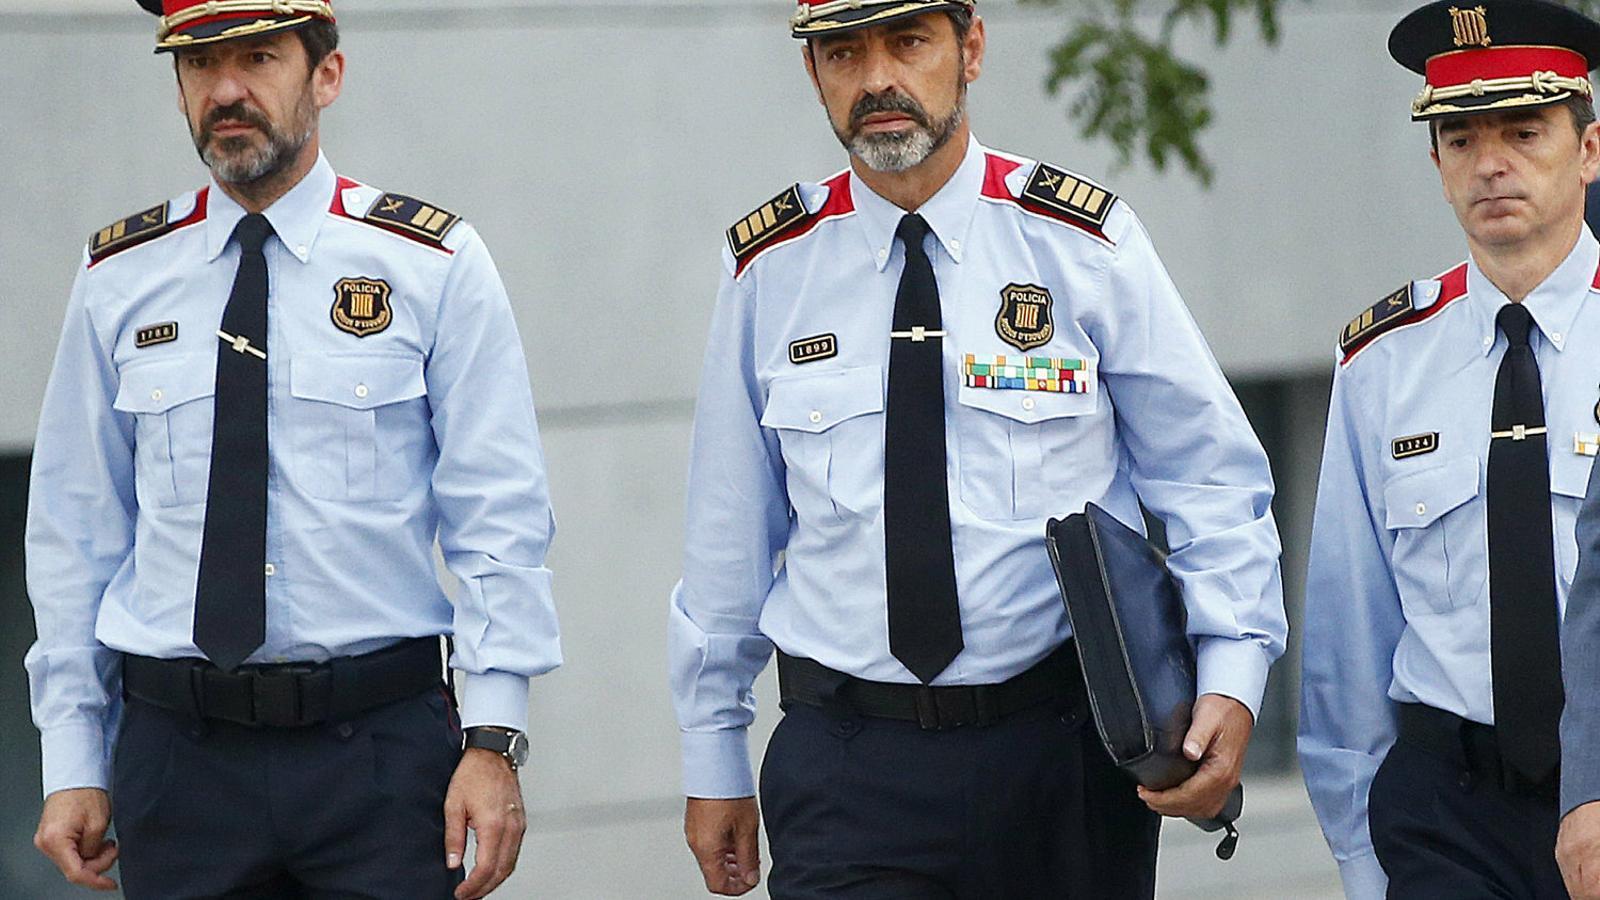 Trapero tenia un pla per traslladar detingut Puigdemont en helicòpter si declarava la DUI